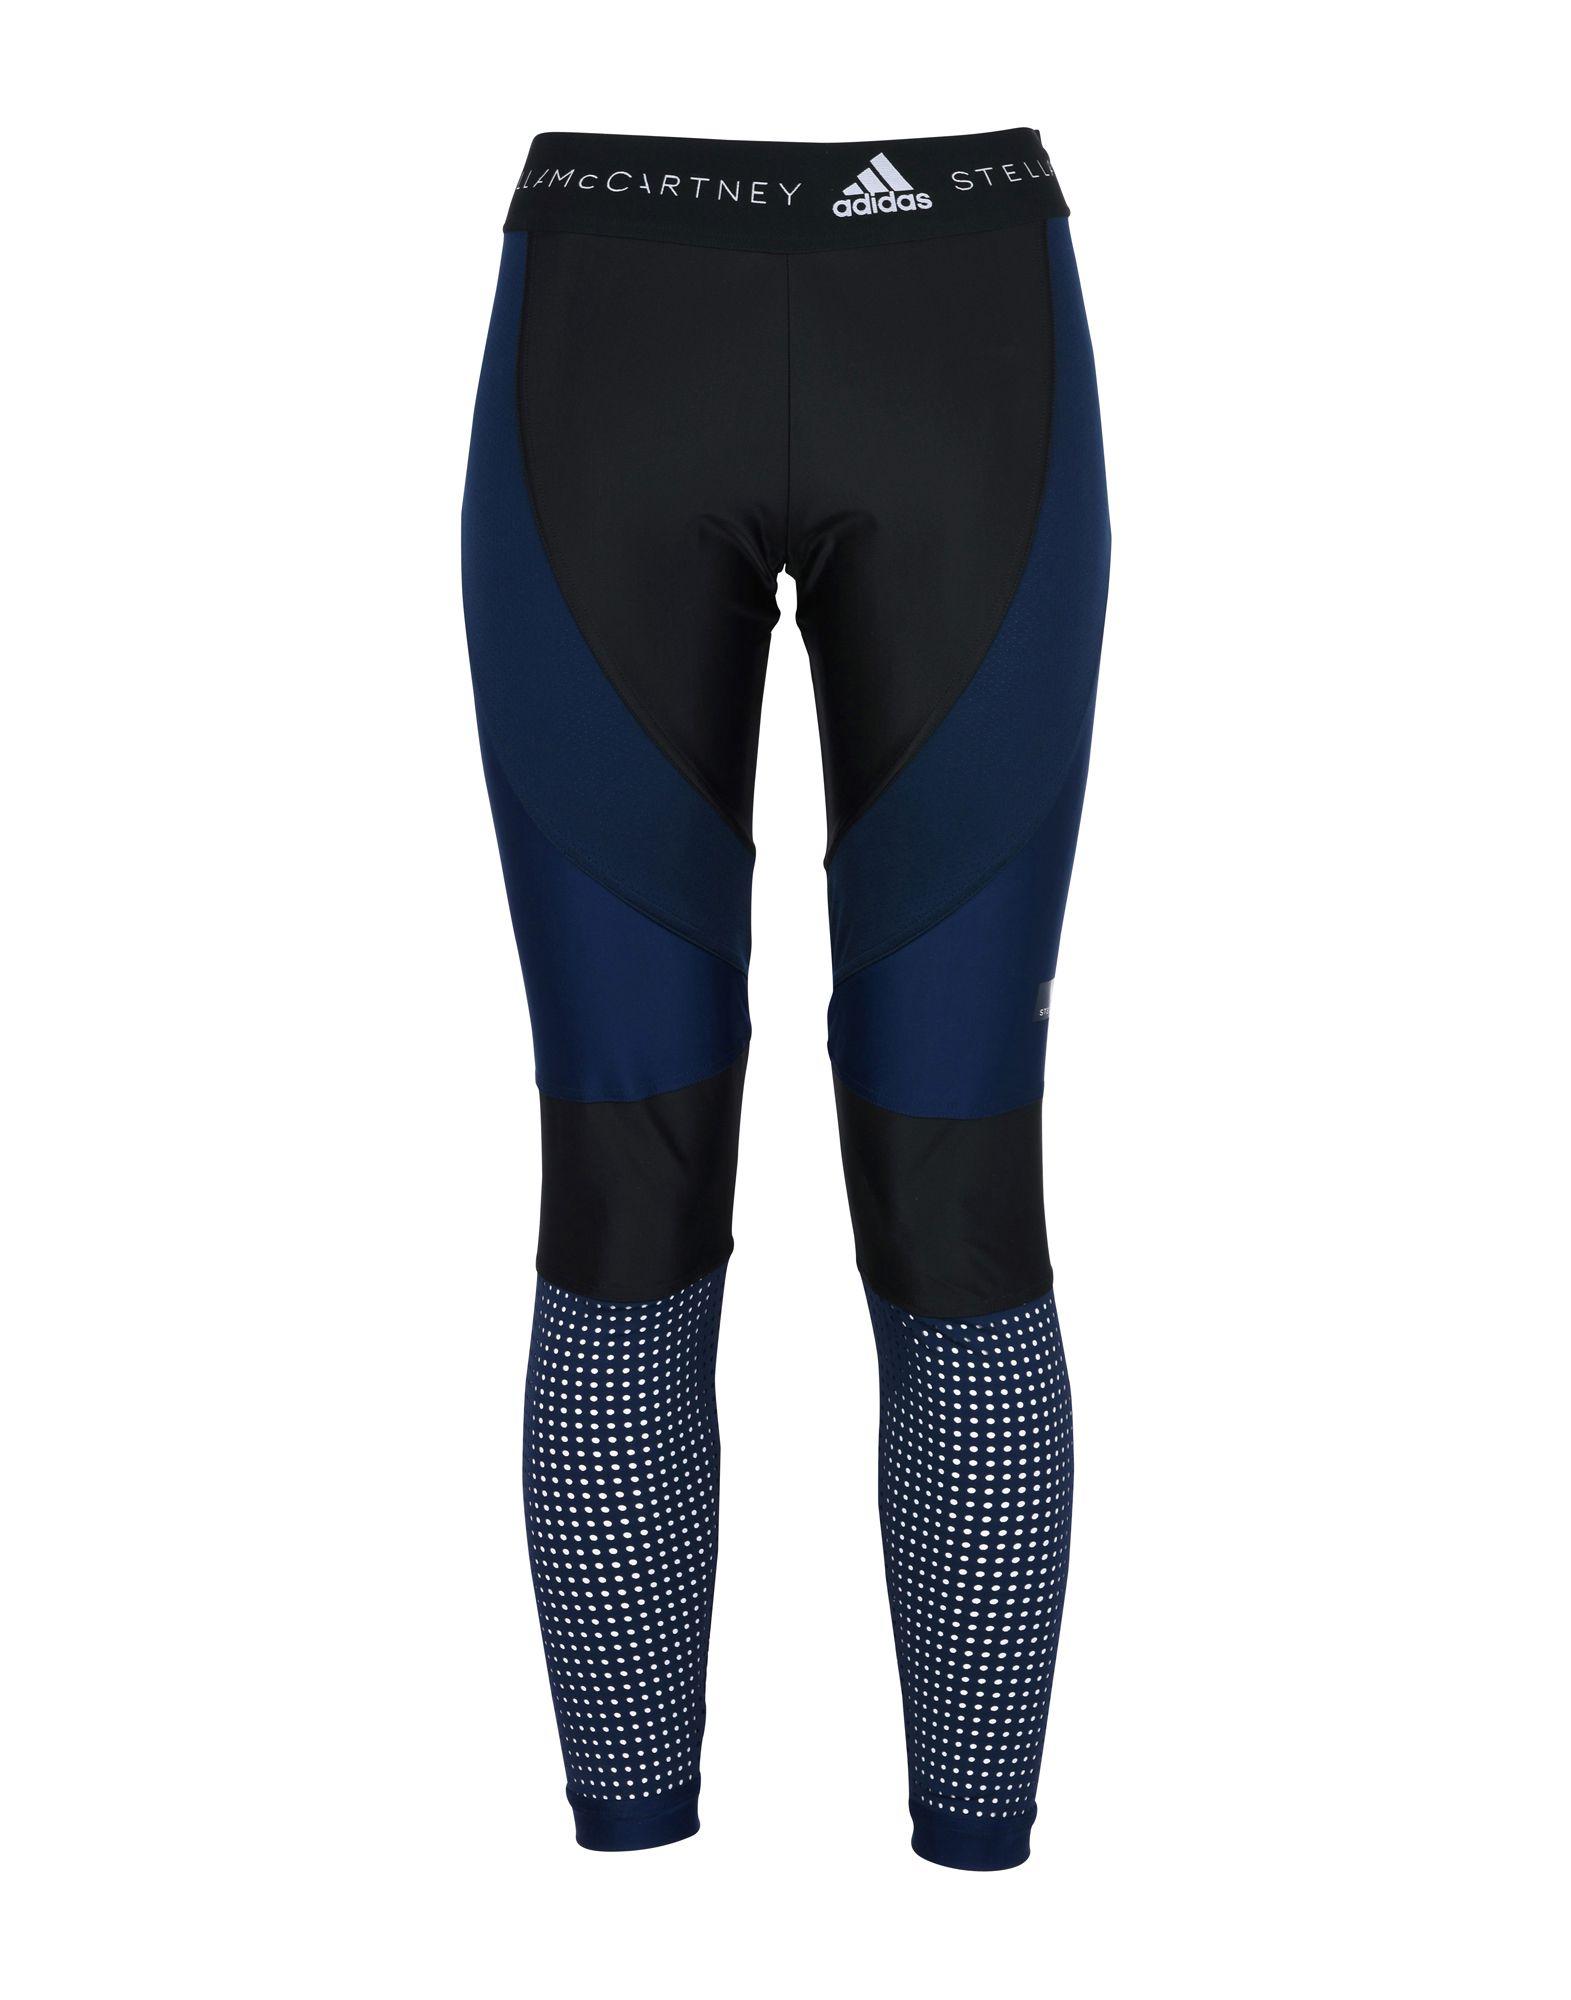 Leggings Adidas By Stella Mccartney Run Long Tight - Donna - Acquista online su nAhimcS0z